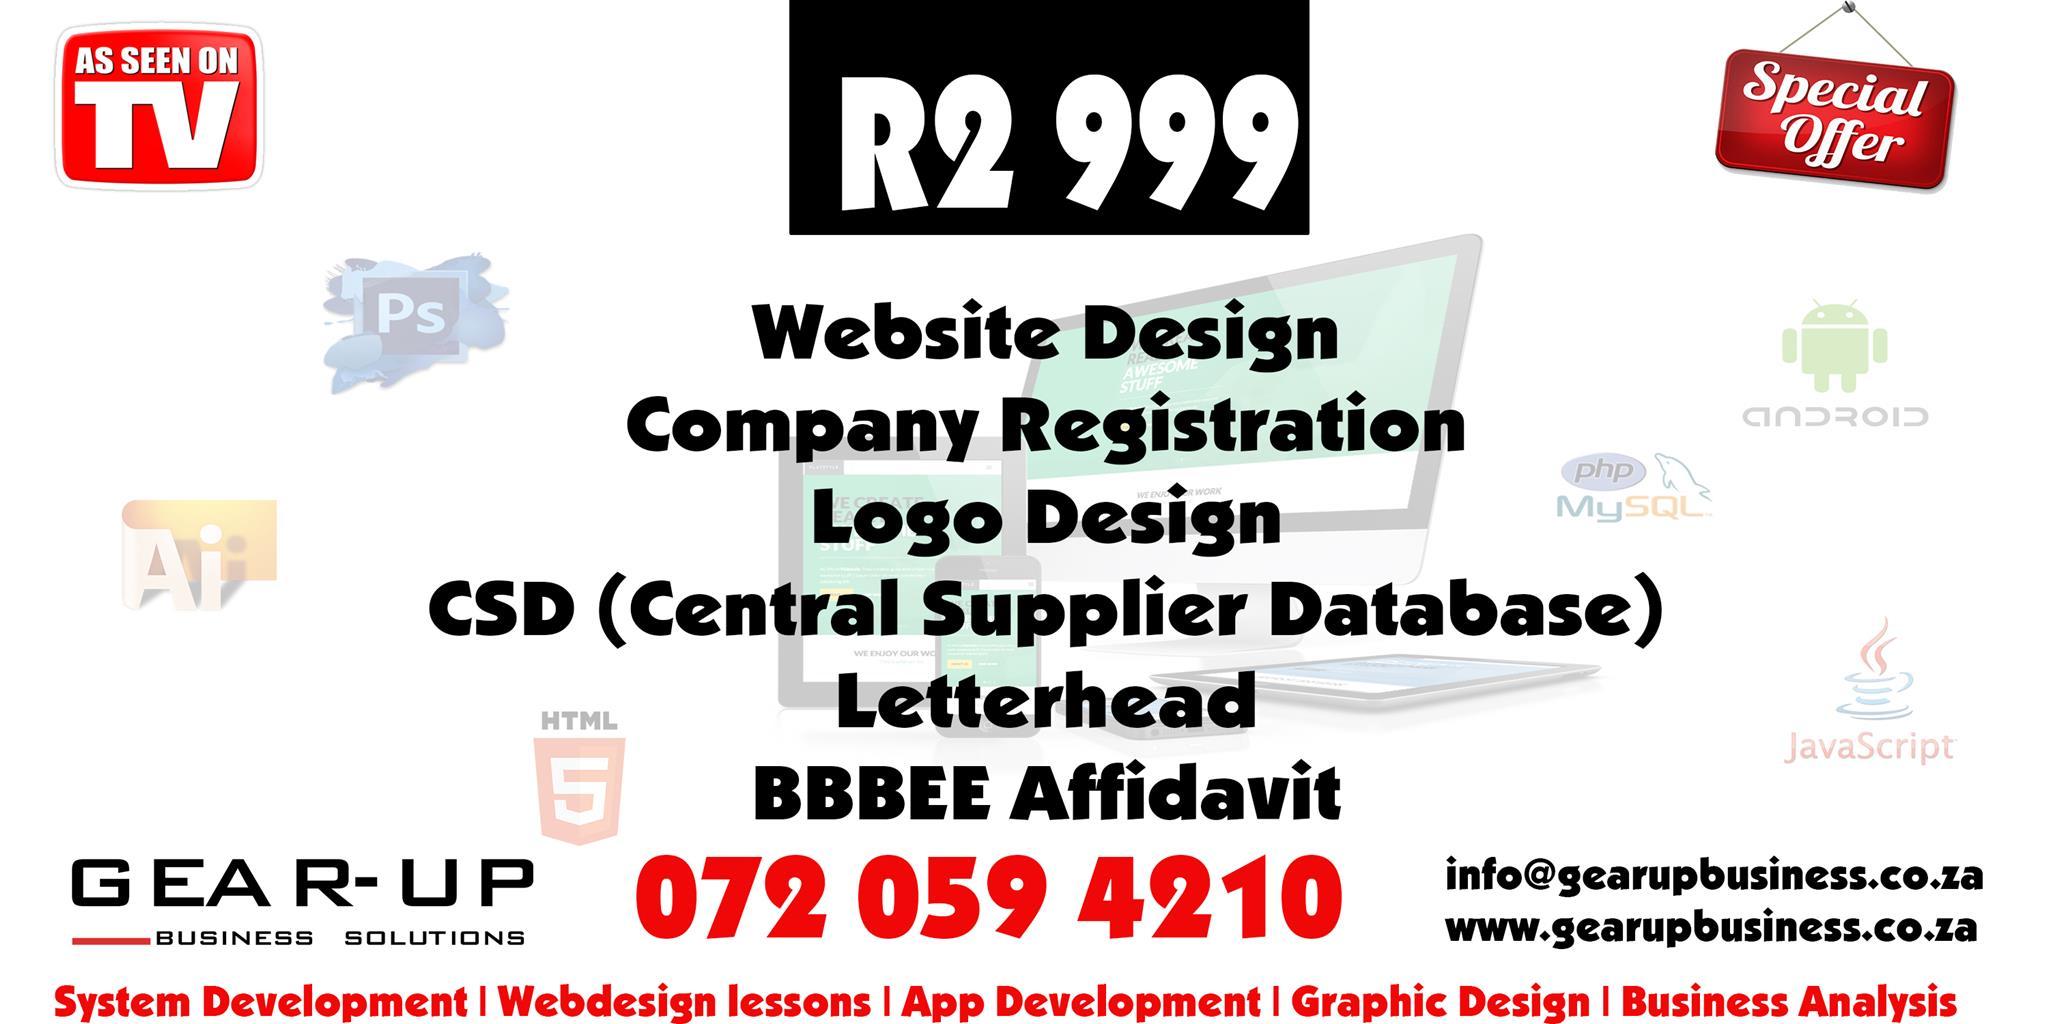 072 059 4210 Company Profile , Company Registration, Logo, Web design